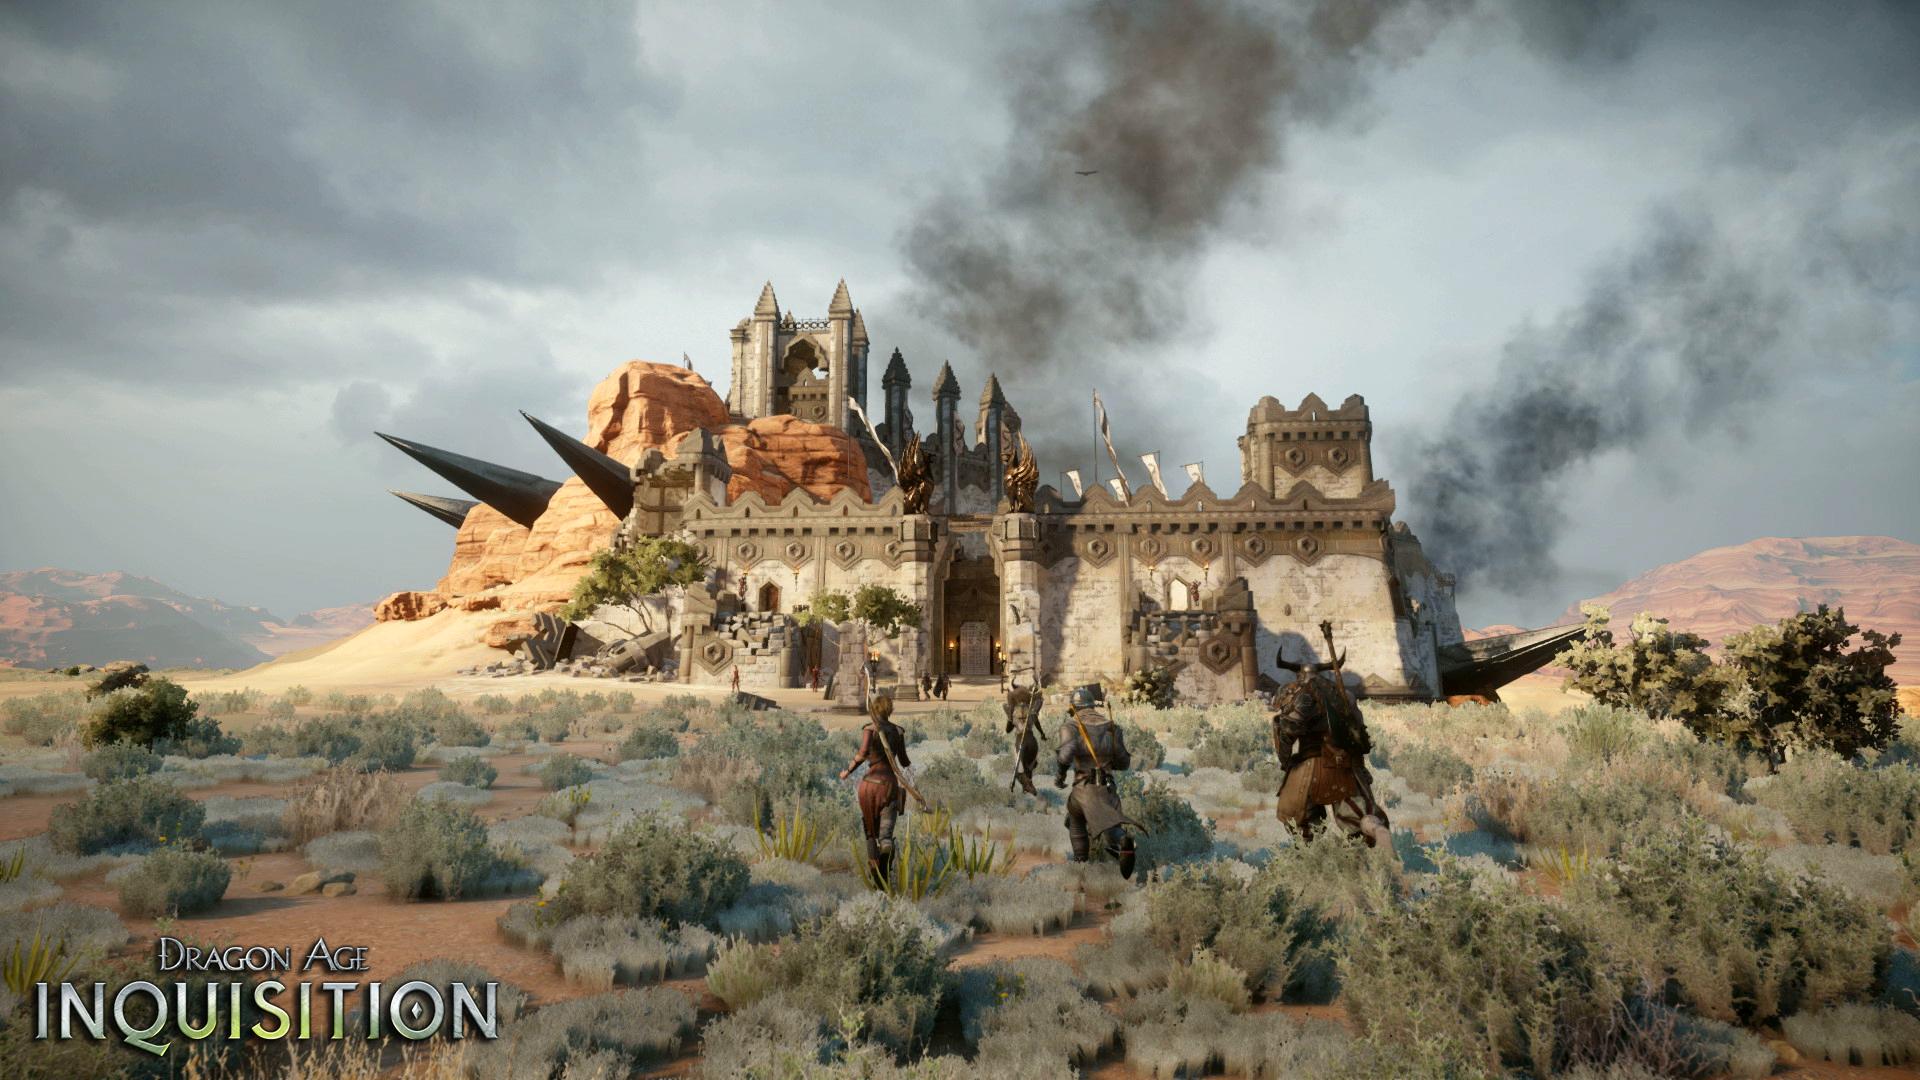 dragon age inquisition update 9 crack torrent